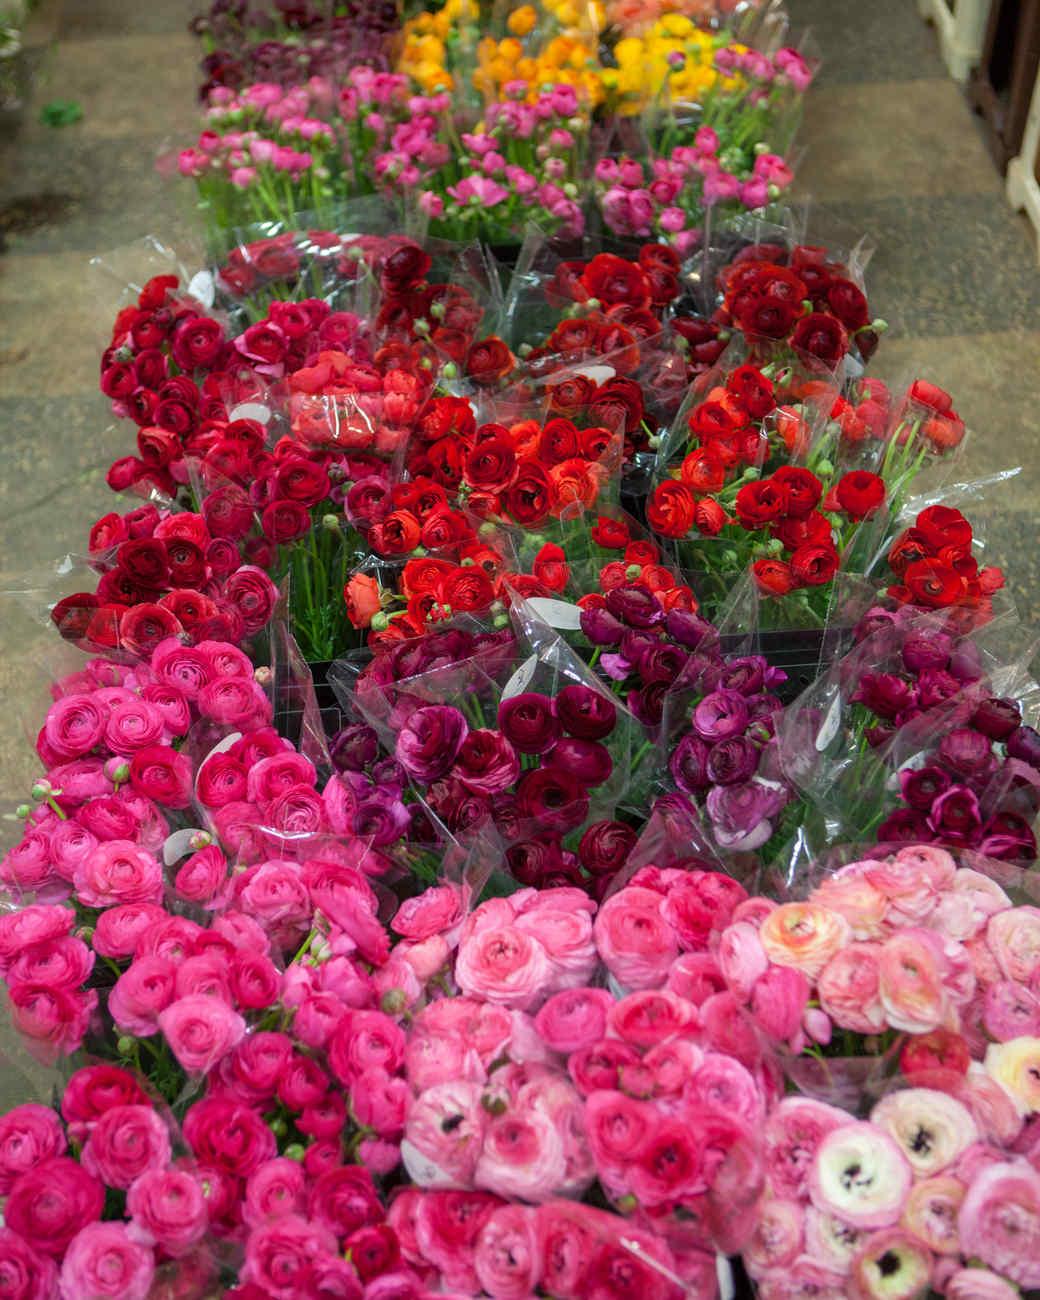 behind-the-scenes-flower-arrangement-7736-d111053.jpg